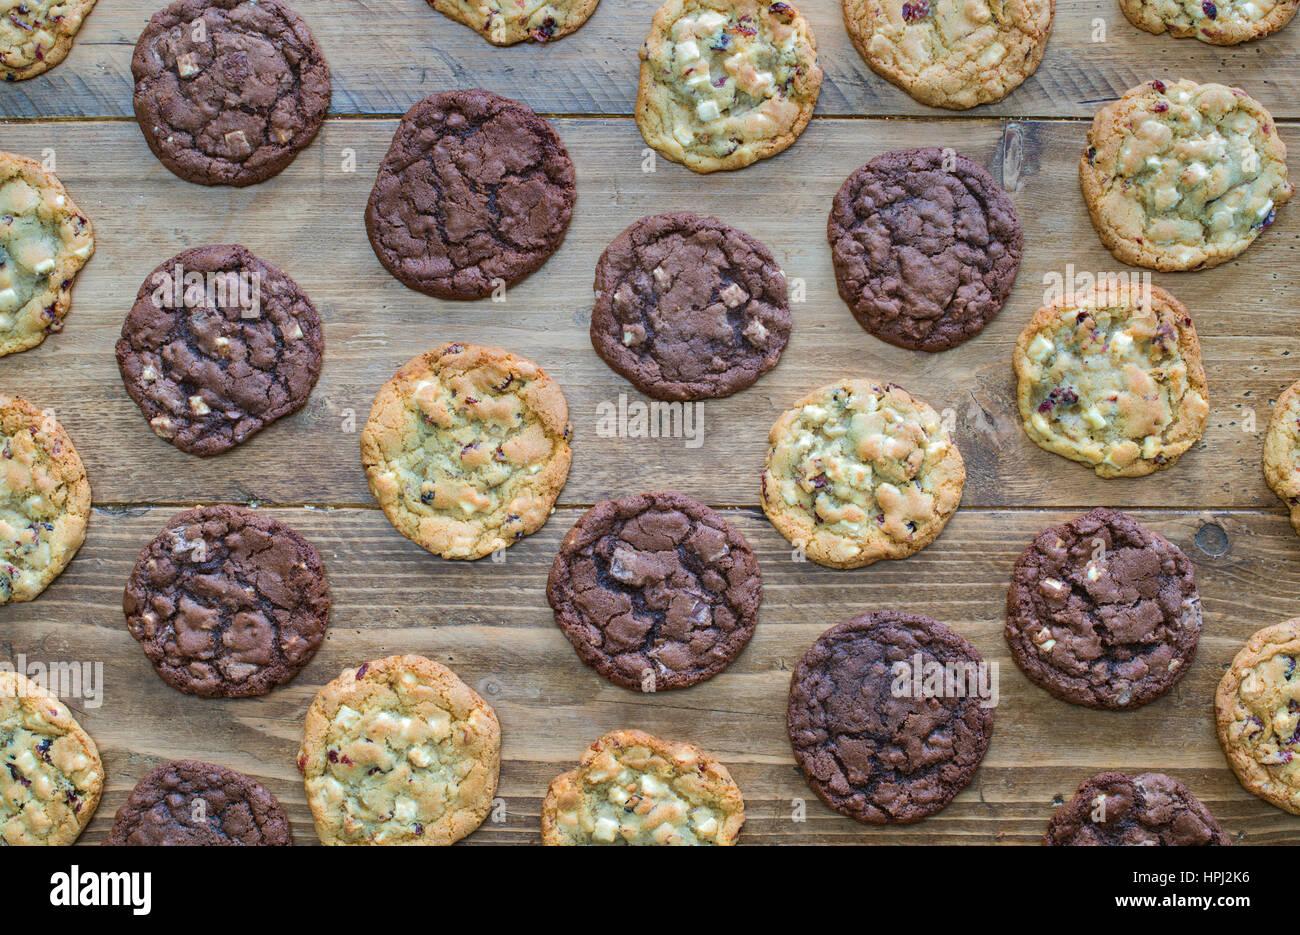 Homemade Chocolate Cookies - Stock Image